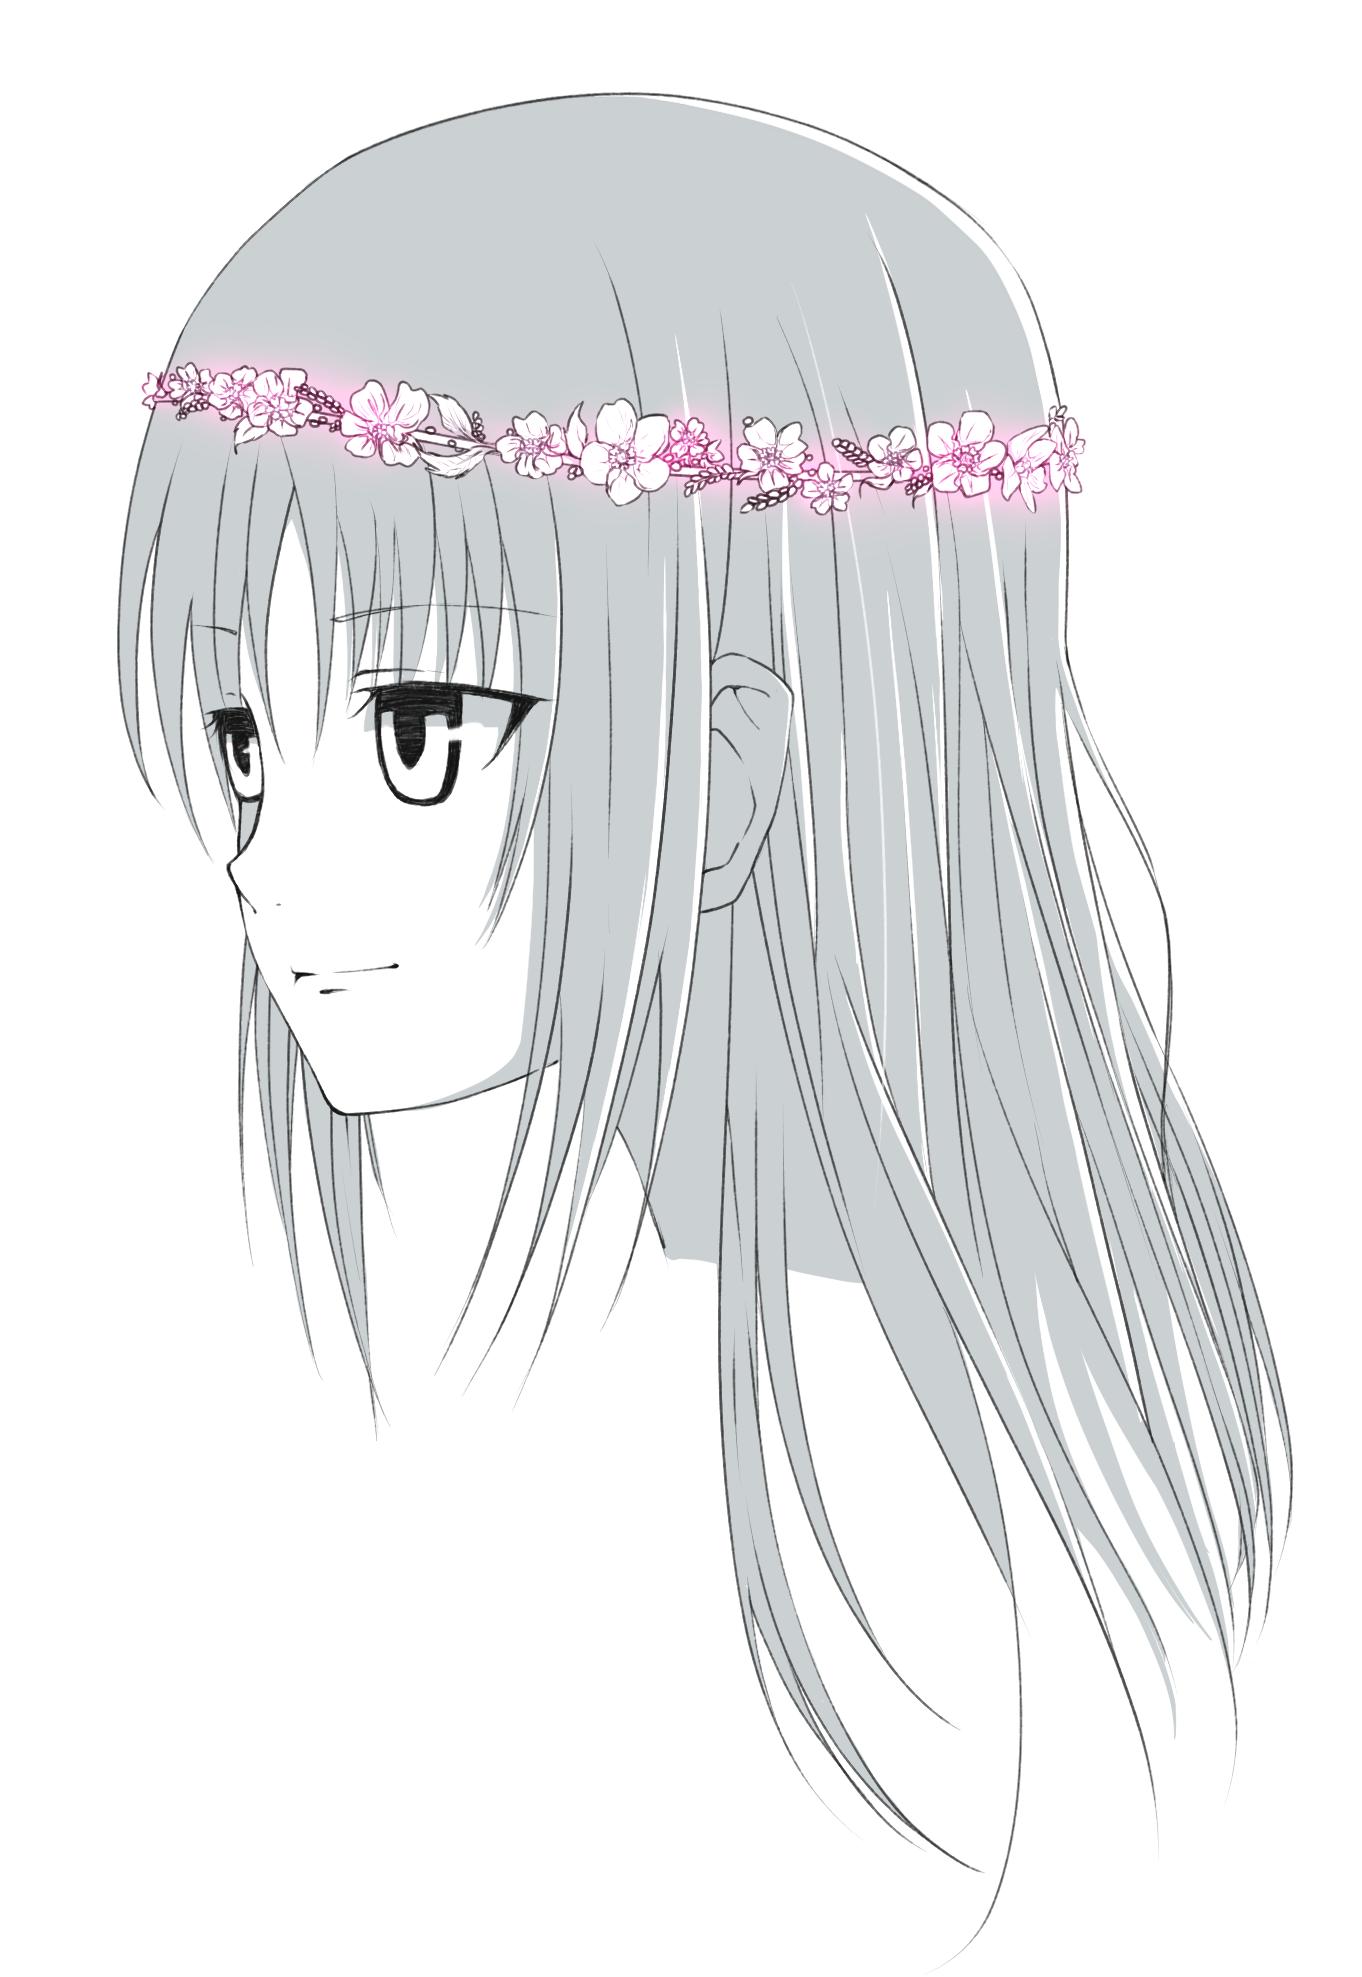 Crown by Gurvana